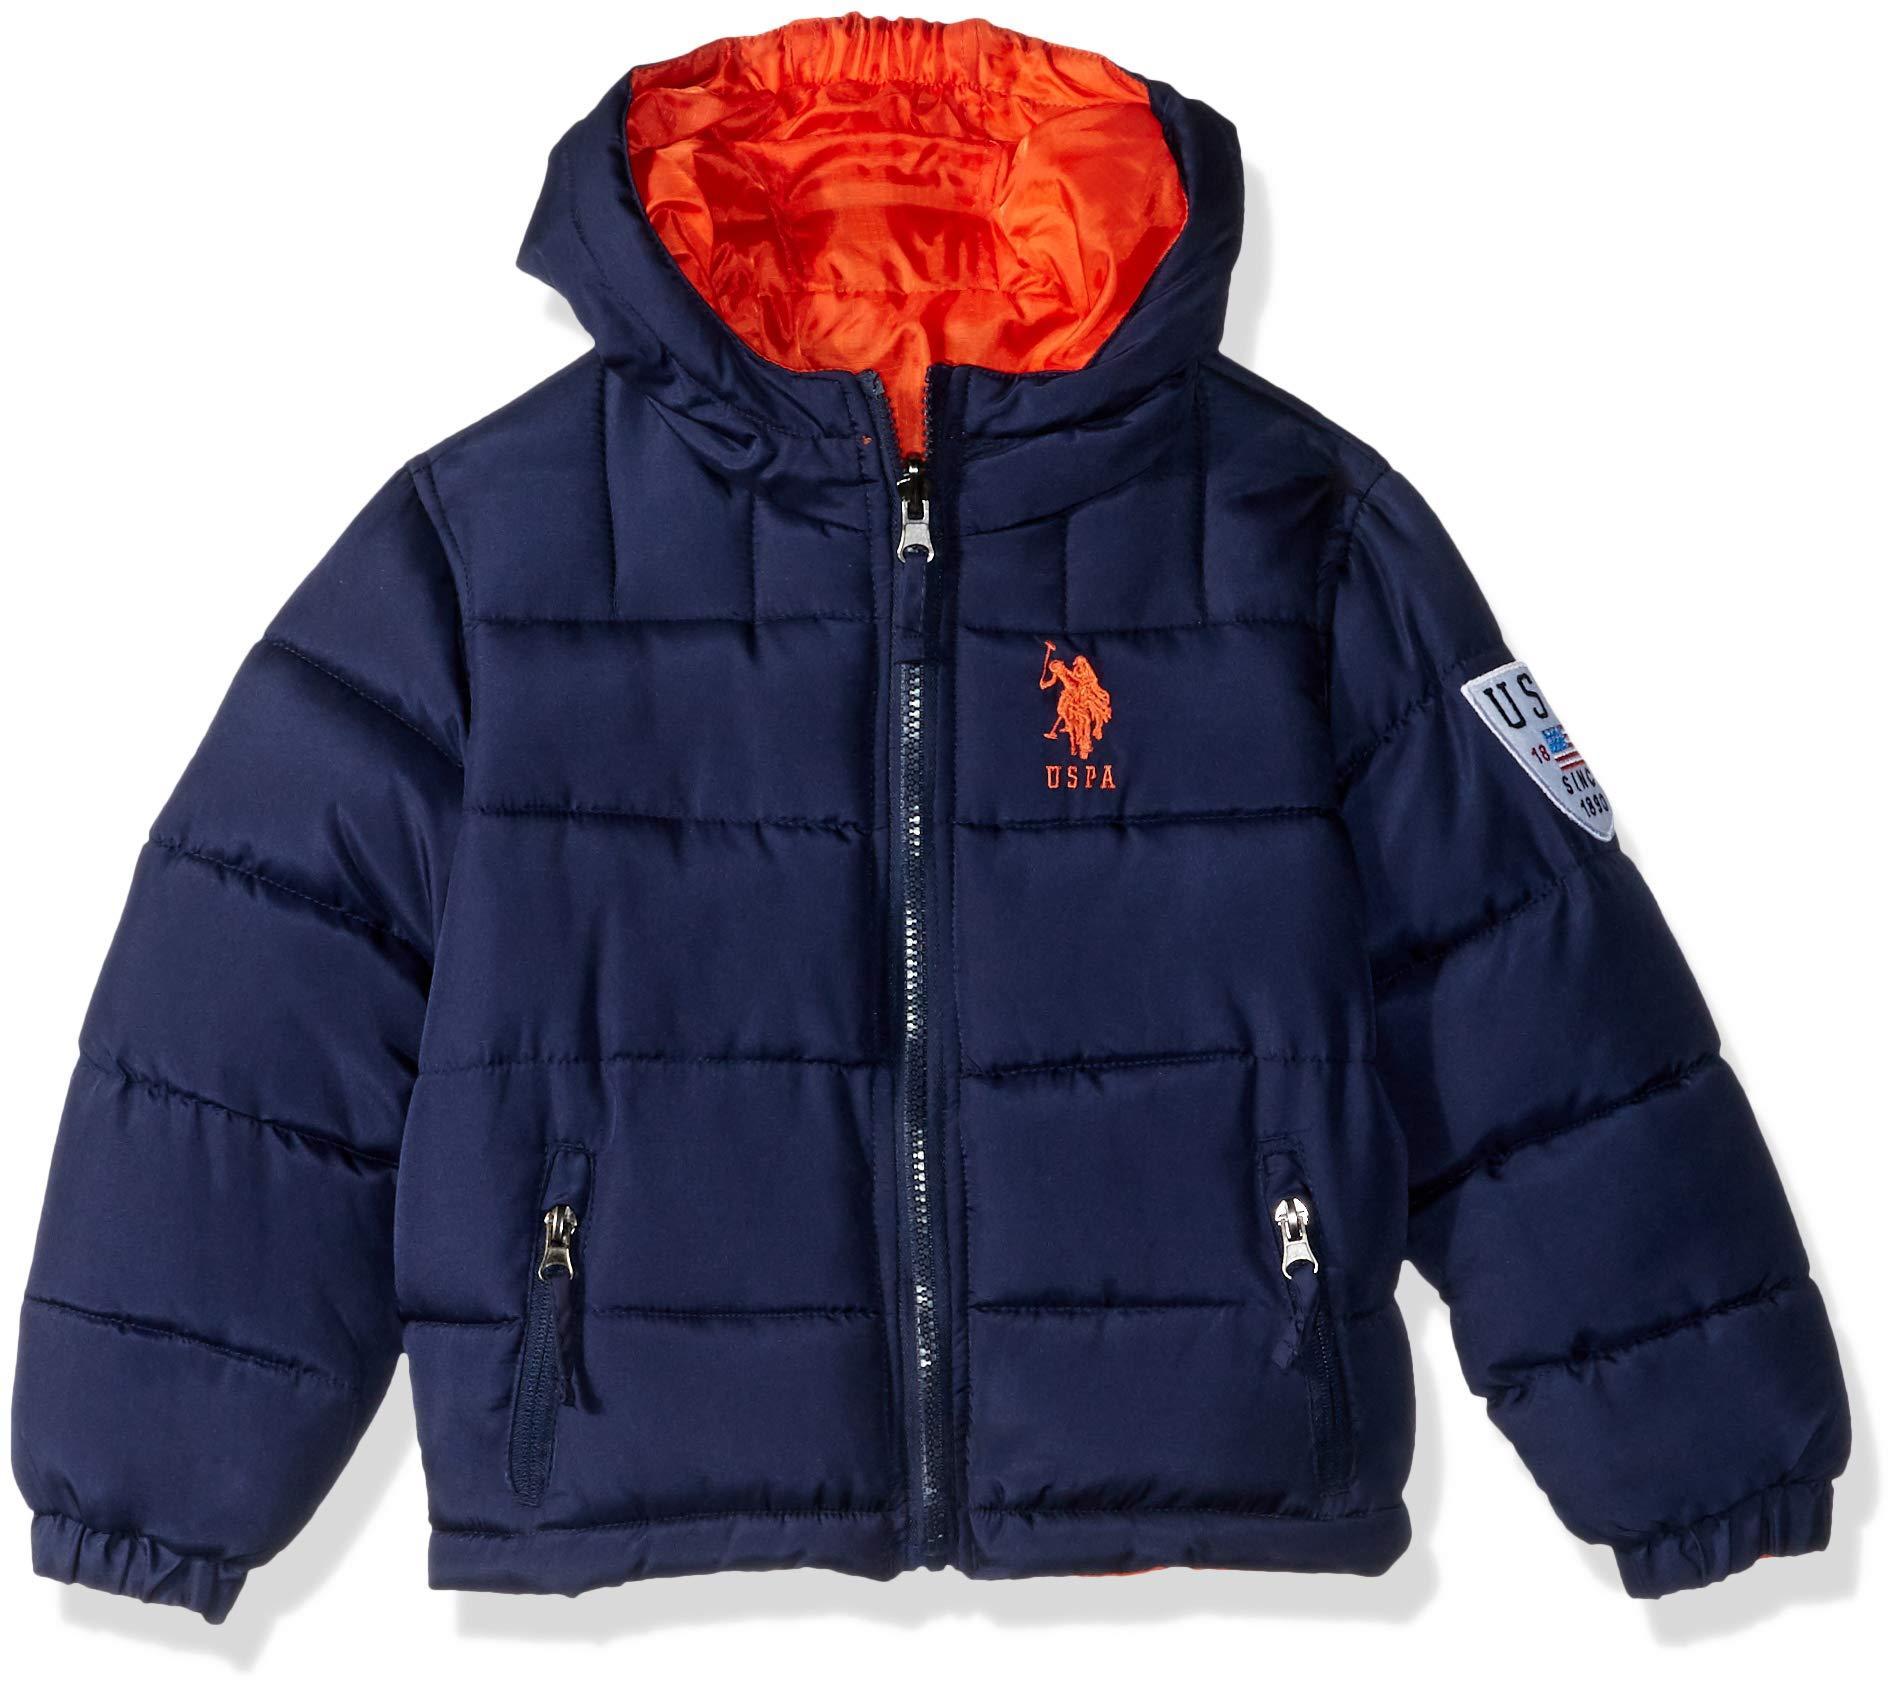 US Polo Association Boys' Toddler Reversible Bubble Jacket, Navy/Orange, 2T